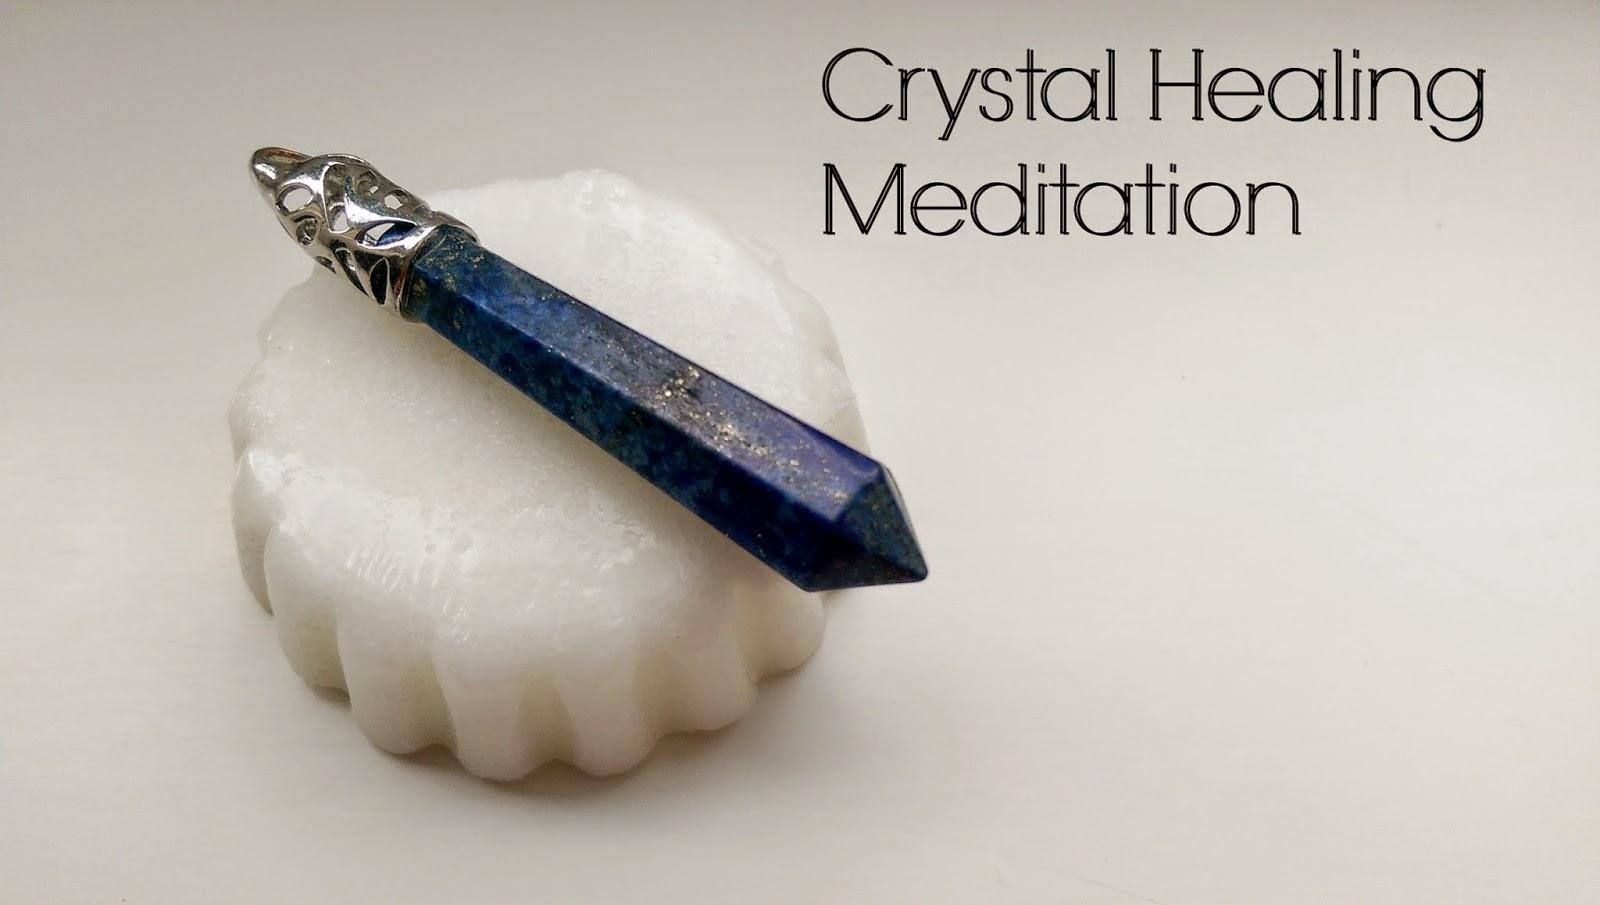 Rebecca Roberta LeGrand Chance: Crystal Healing Through